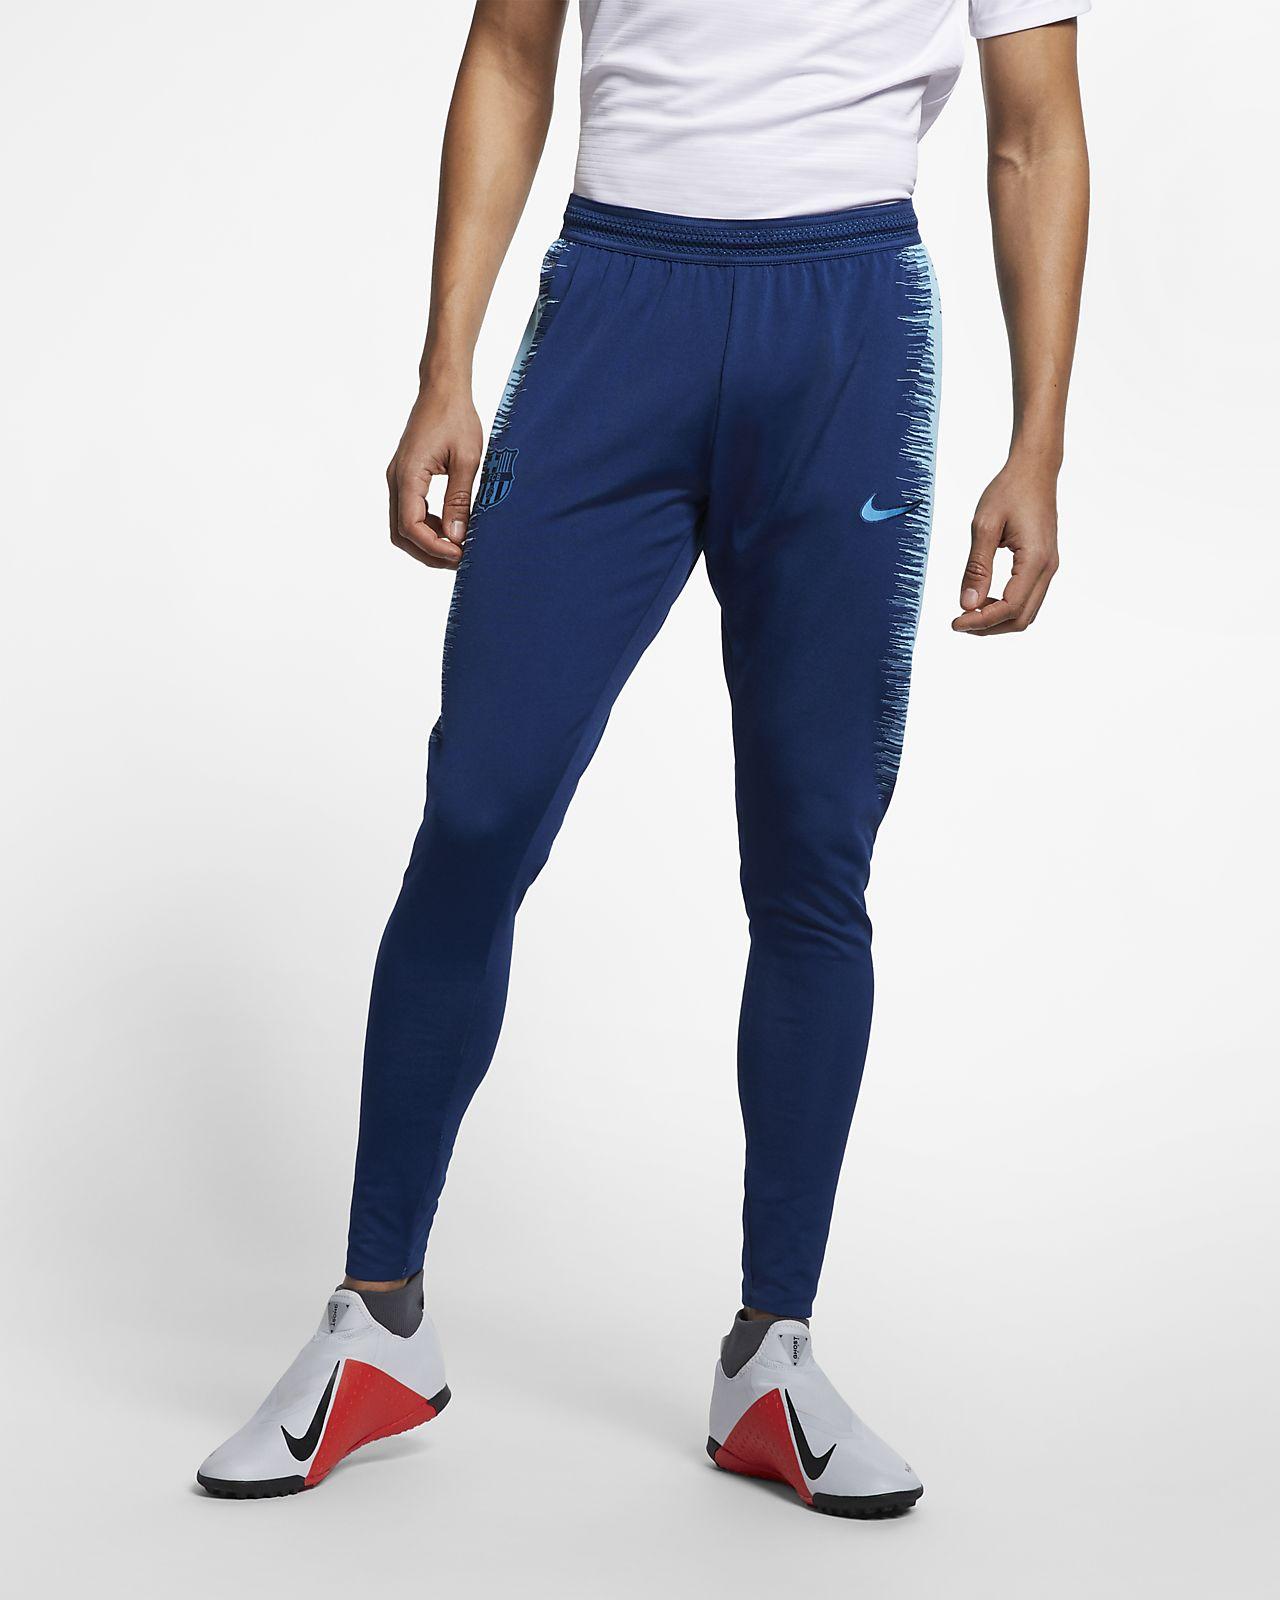 online retailer c7018 b1f11 FC Barcelona VaporKnit Strike Herren-Fußballhose. Nike.com LU